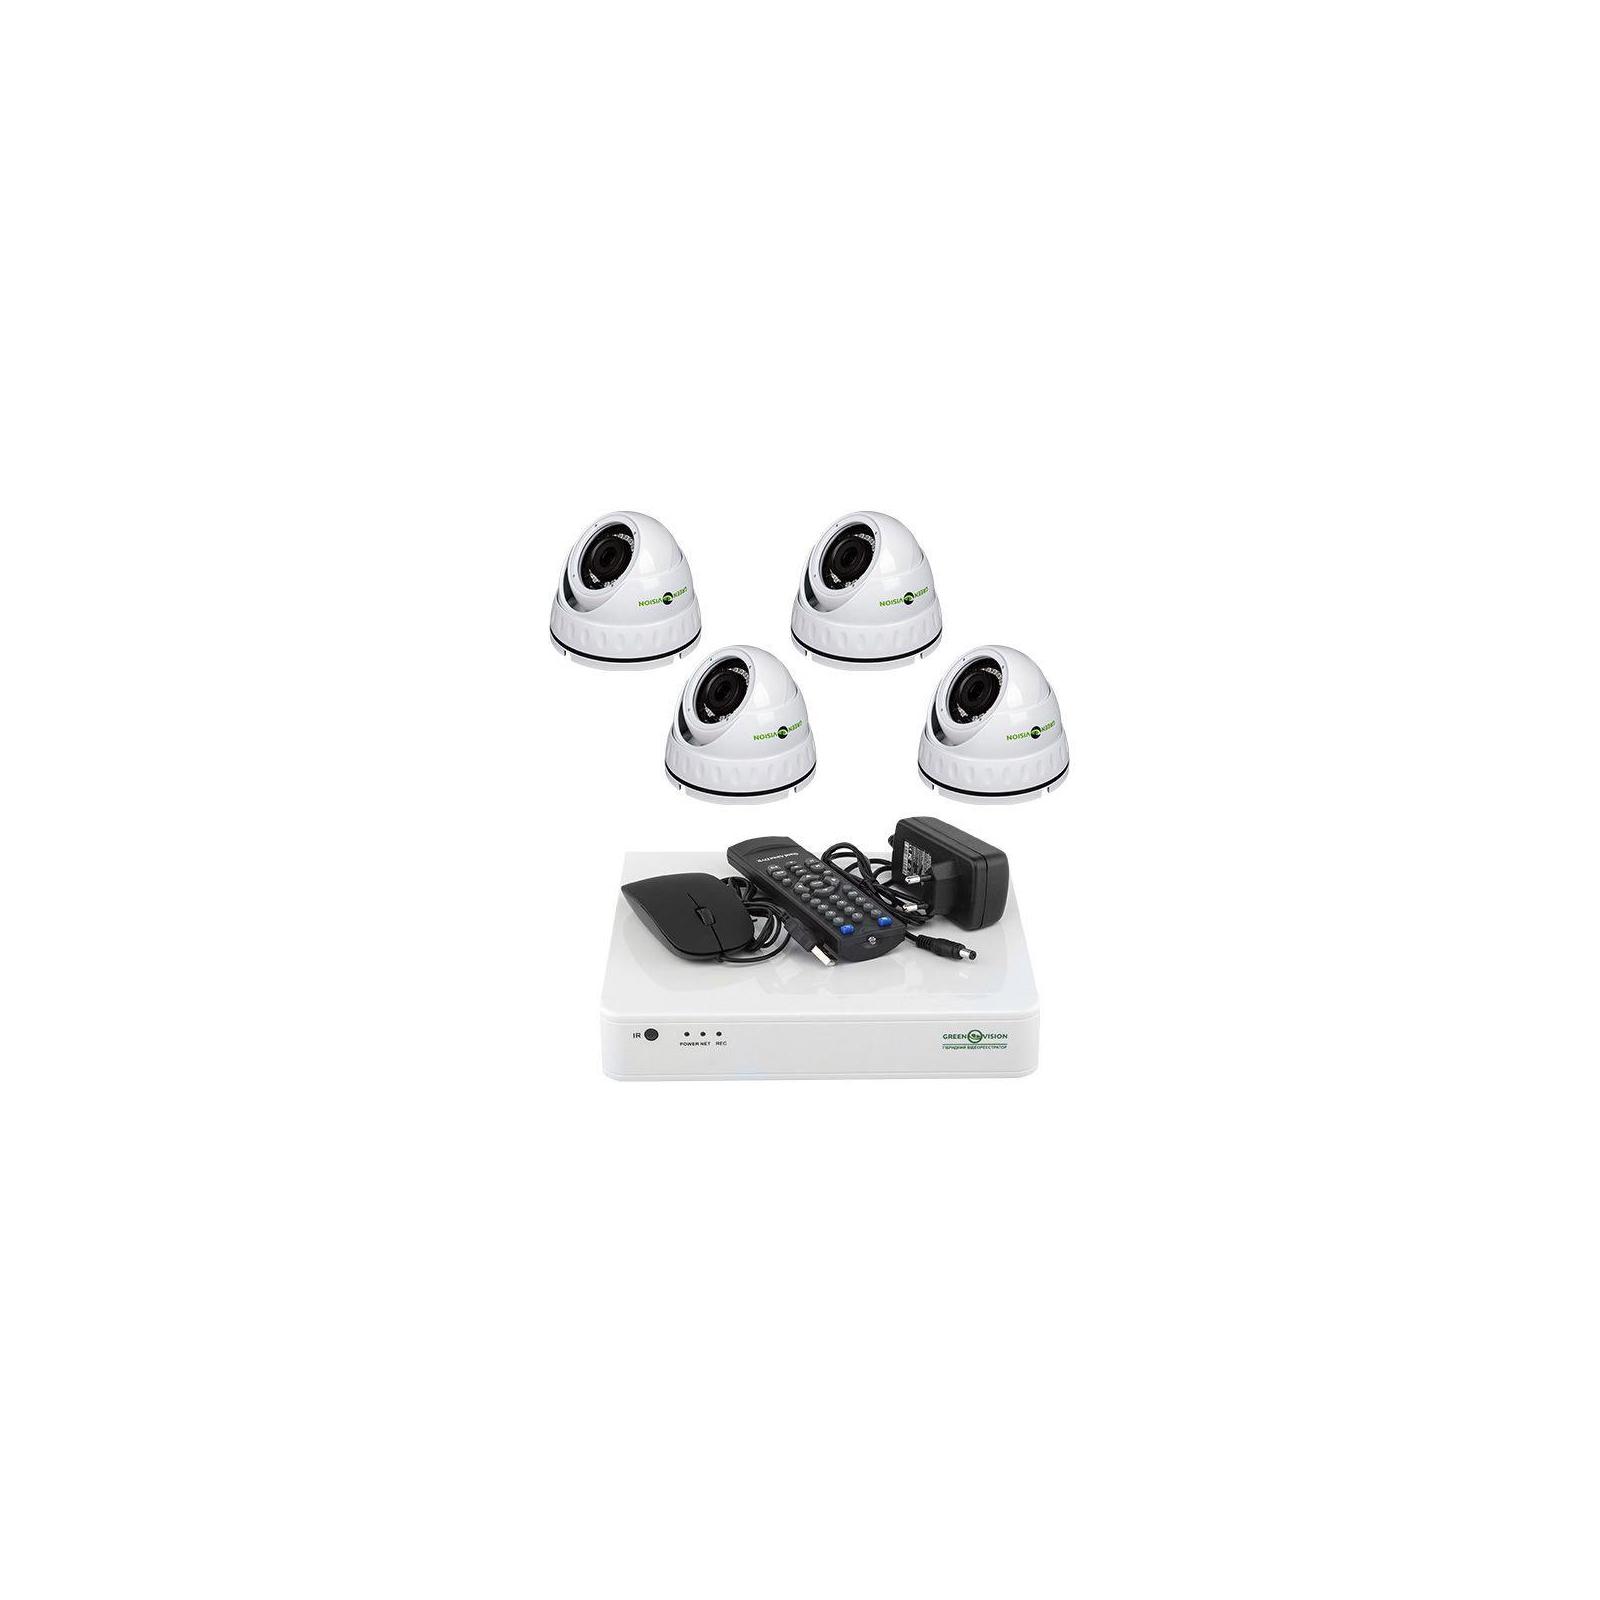 Комплект видеонаблюдения Greenvision GV-K-S16/04 1080P (6659)